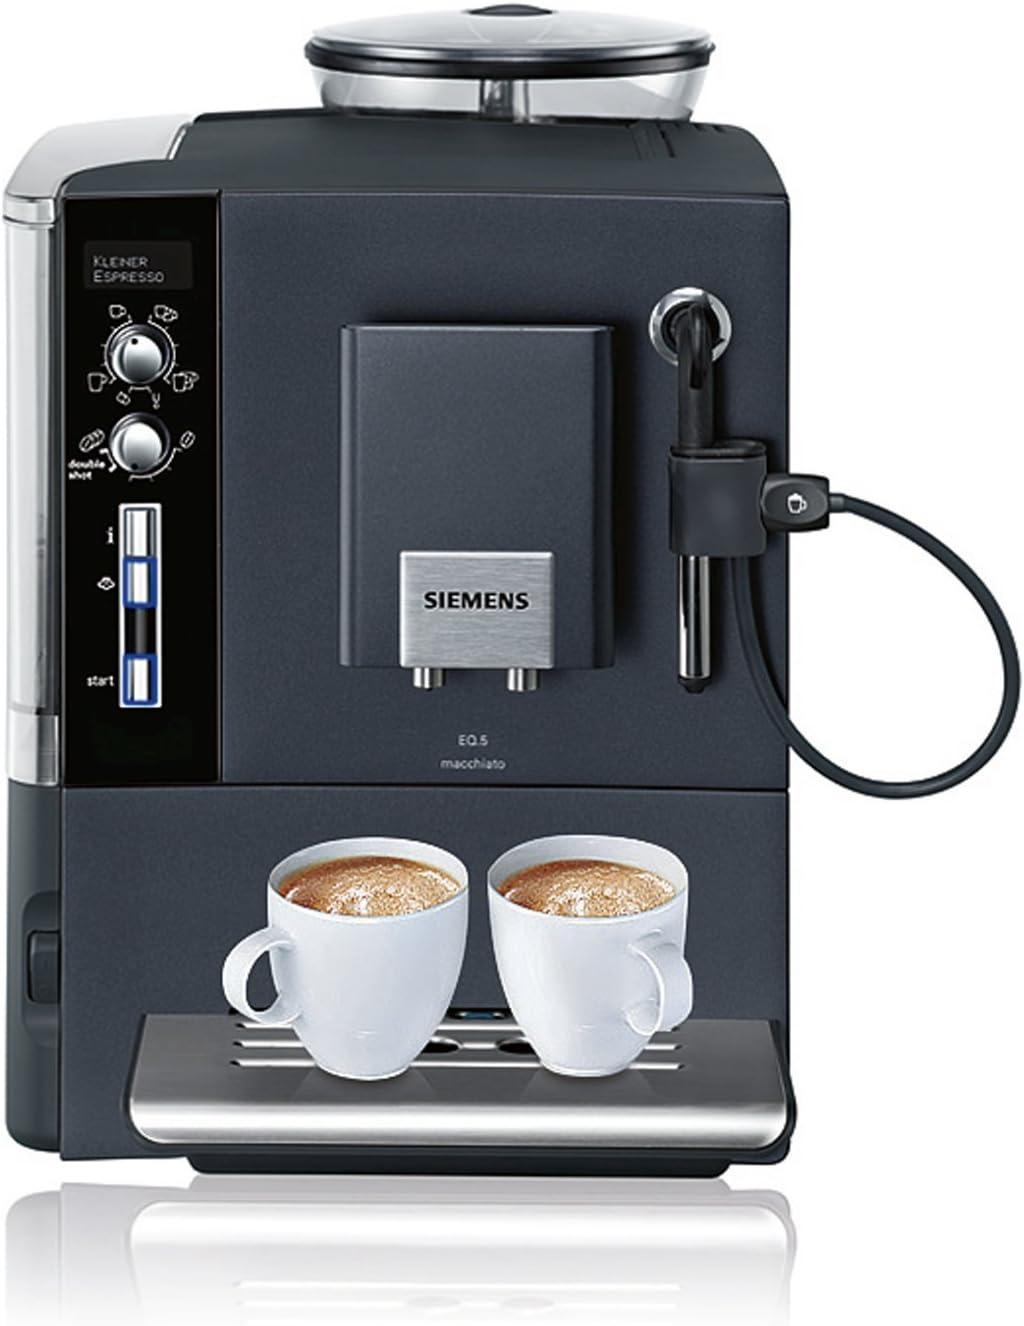 Siemens TE503509DE, Plata, 1600 W, 220 - Máquina de café: Amazon ...